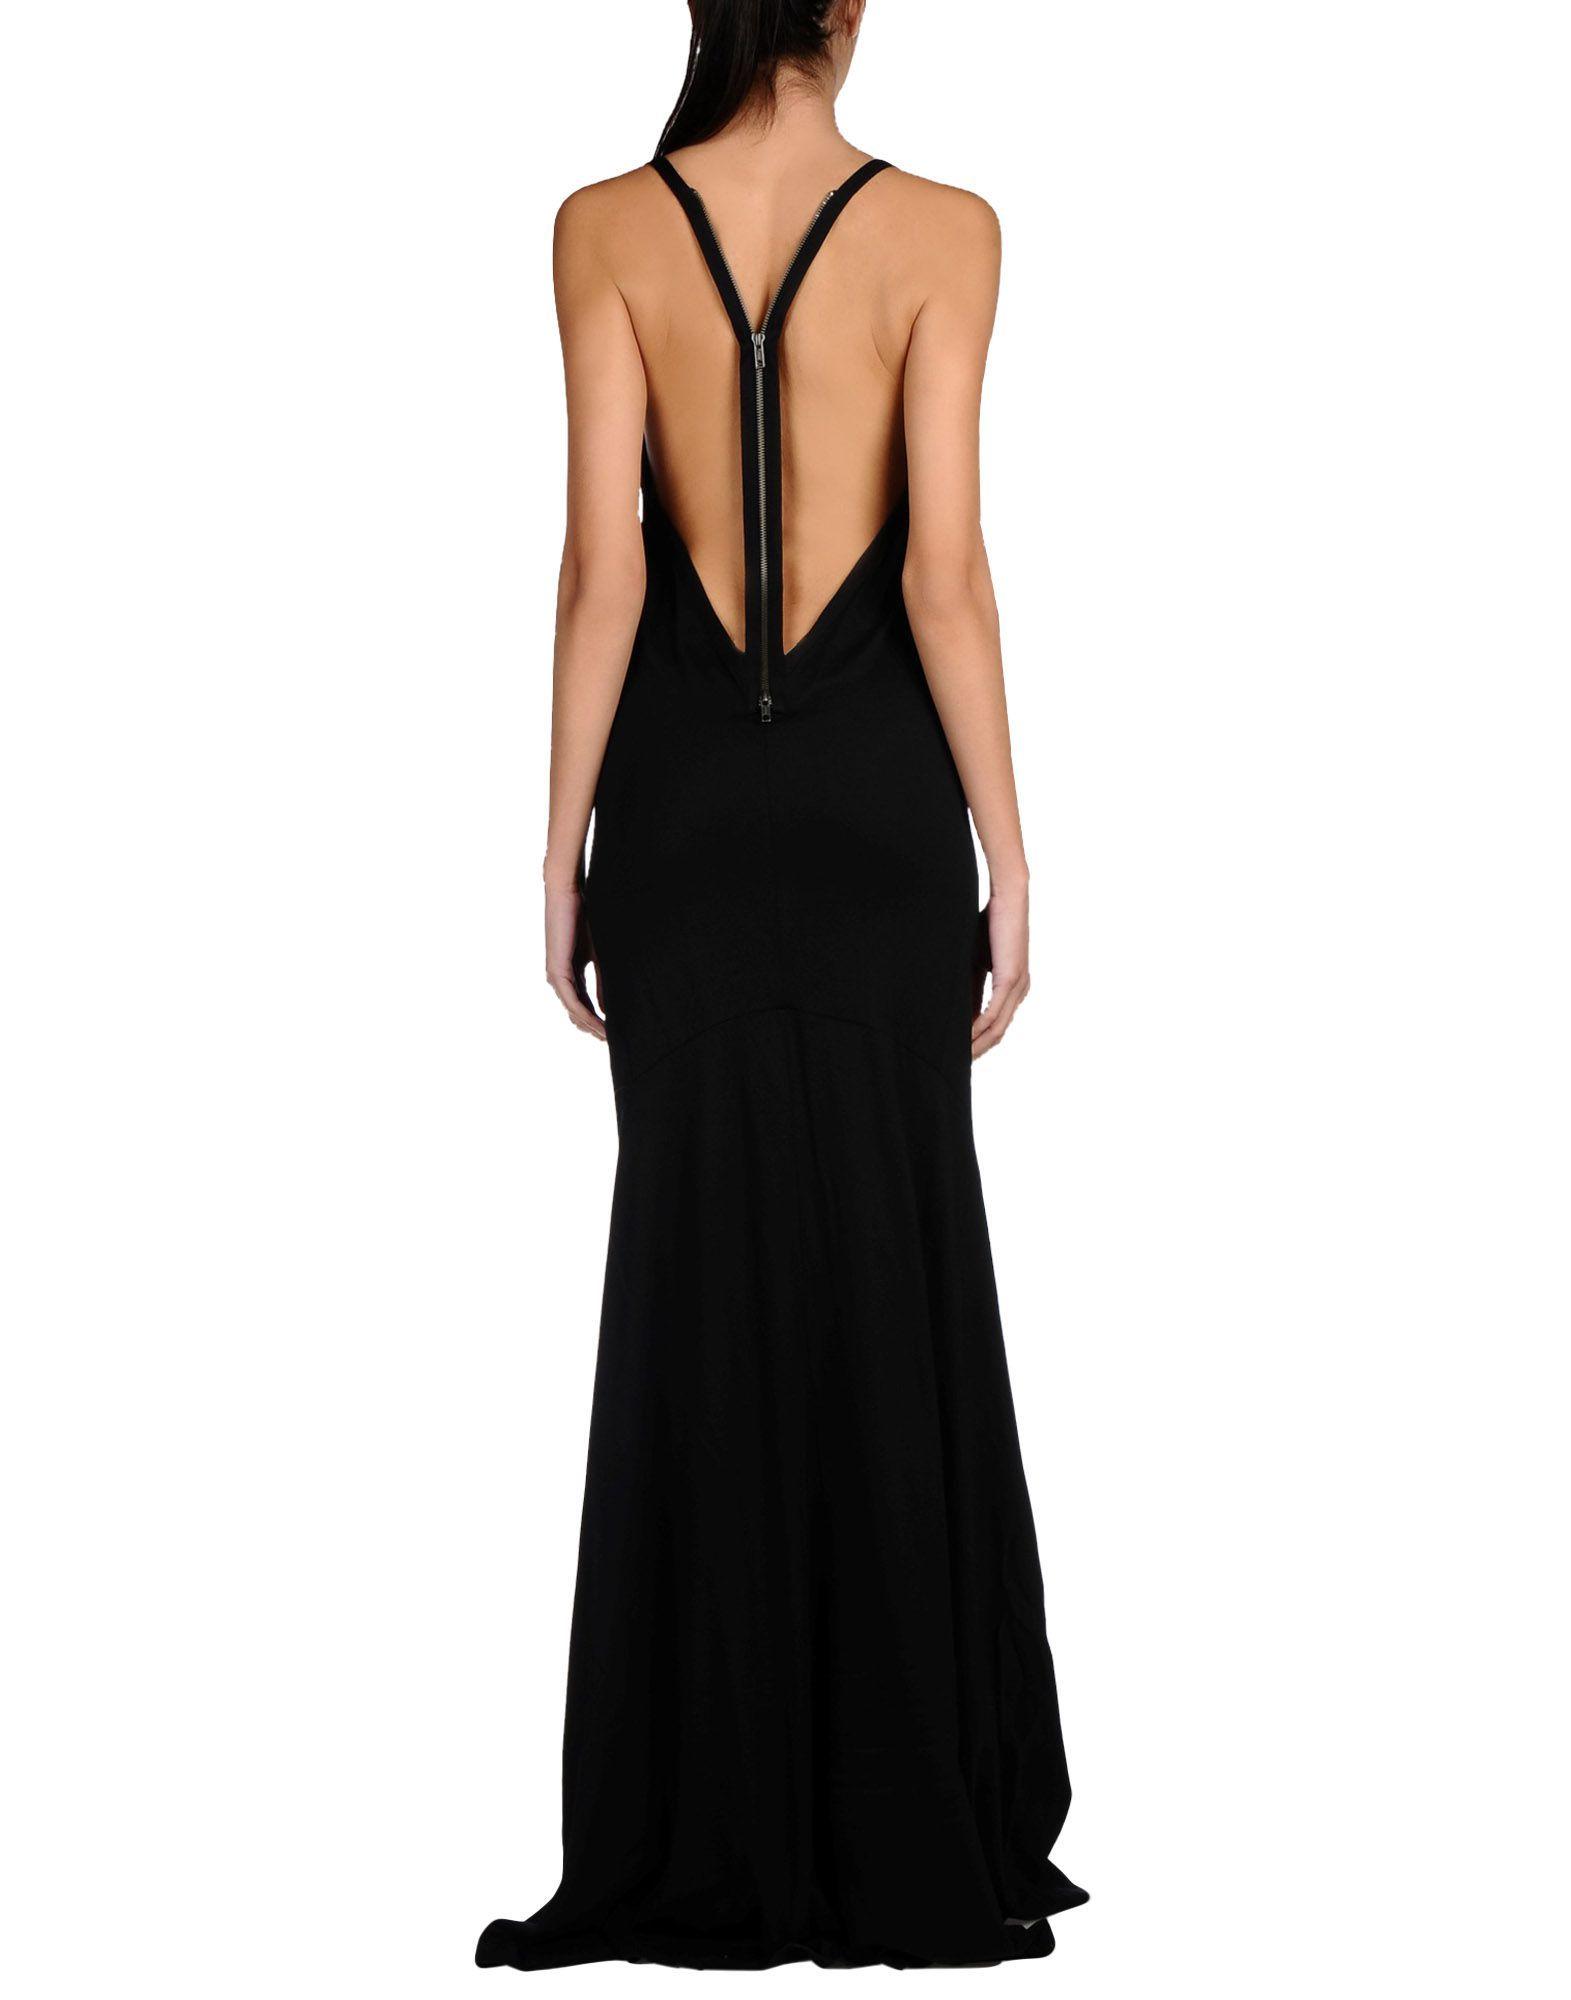 Ann Demeulemeester Langes Kleid Damen - Lange Kleider Ann Demeulemeester auf YOOX - 34694203PB